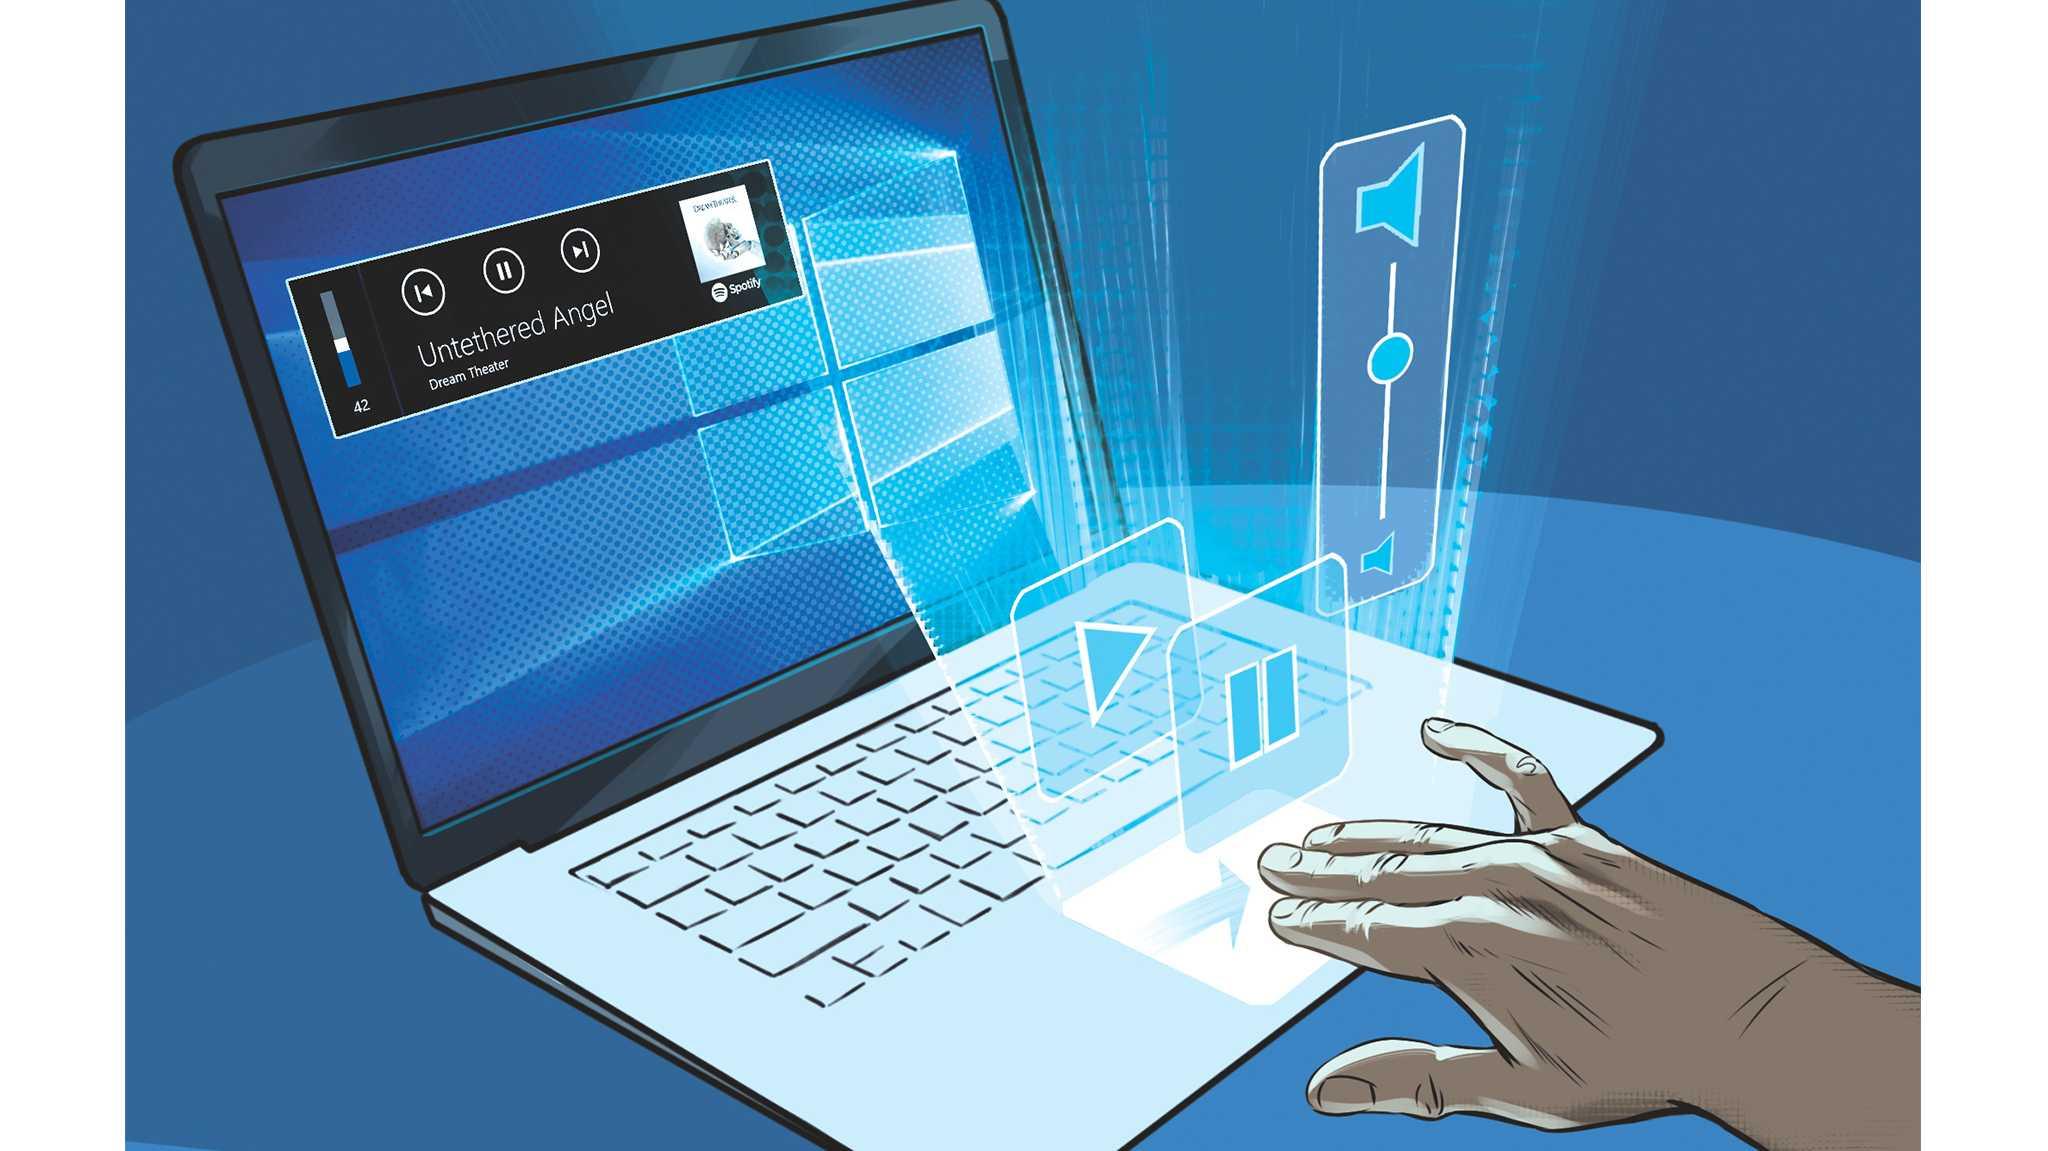 Präzisions-Touchpads unter Windows 10 ausreizen